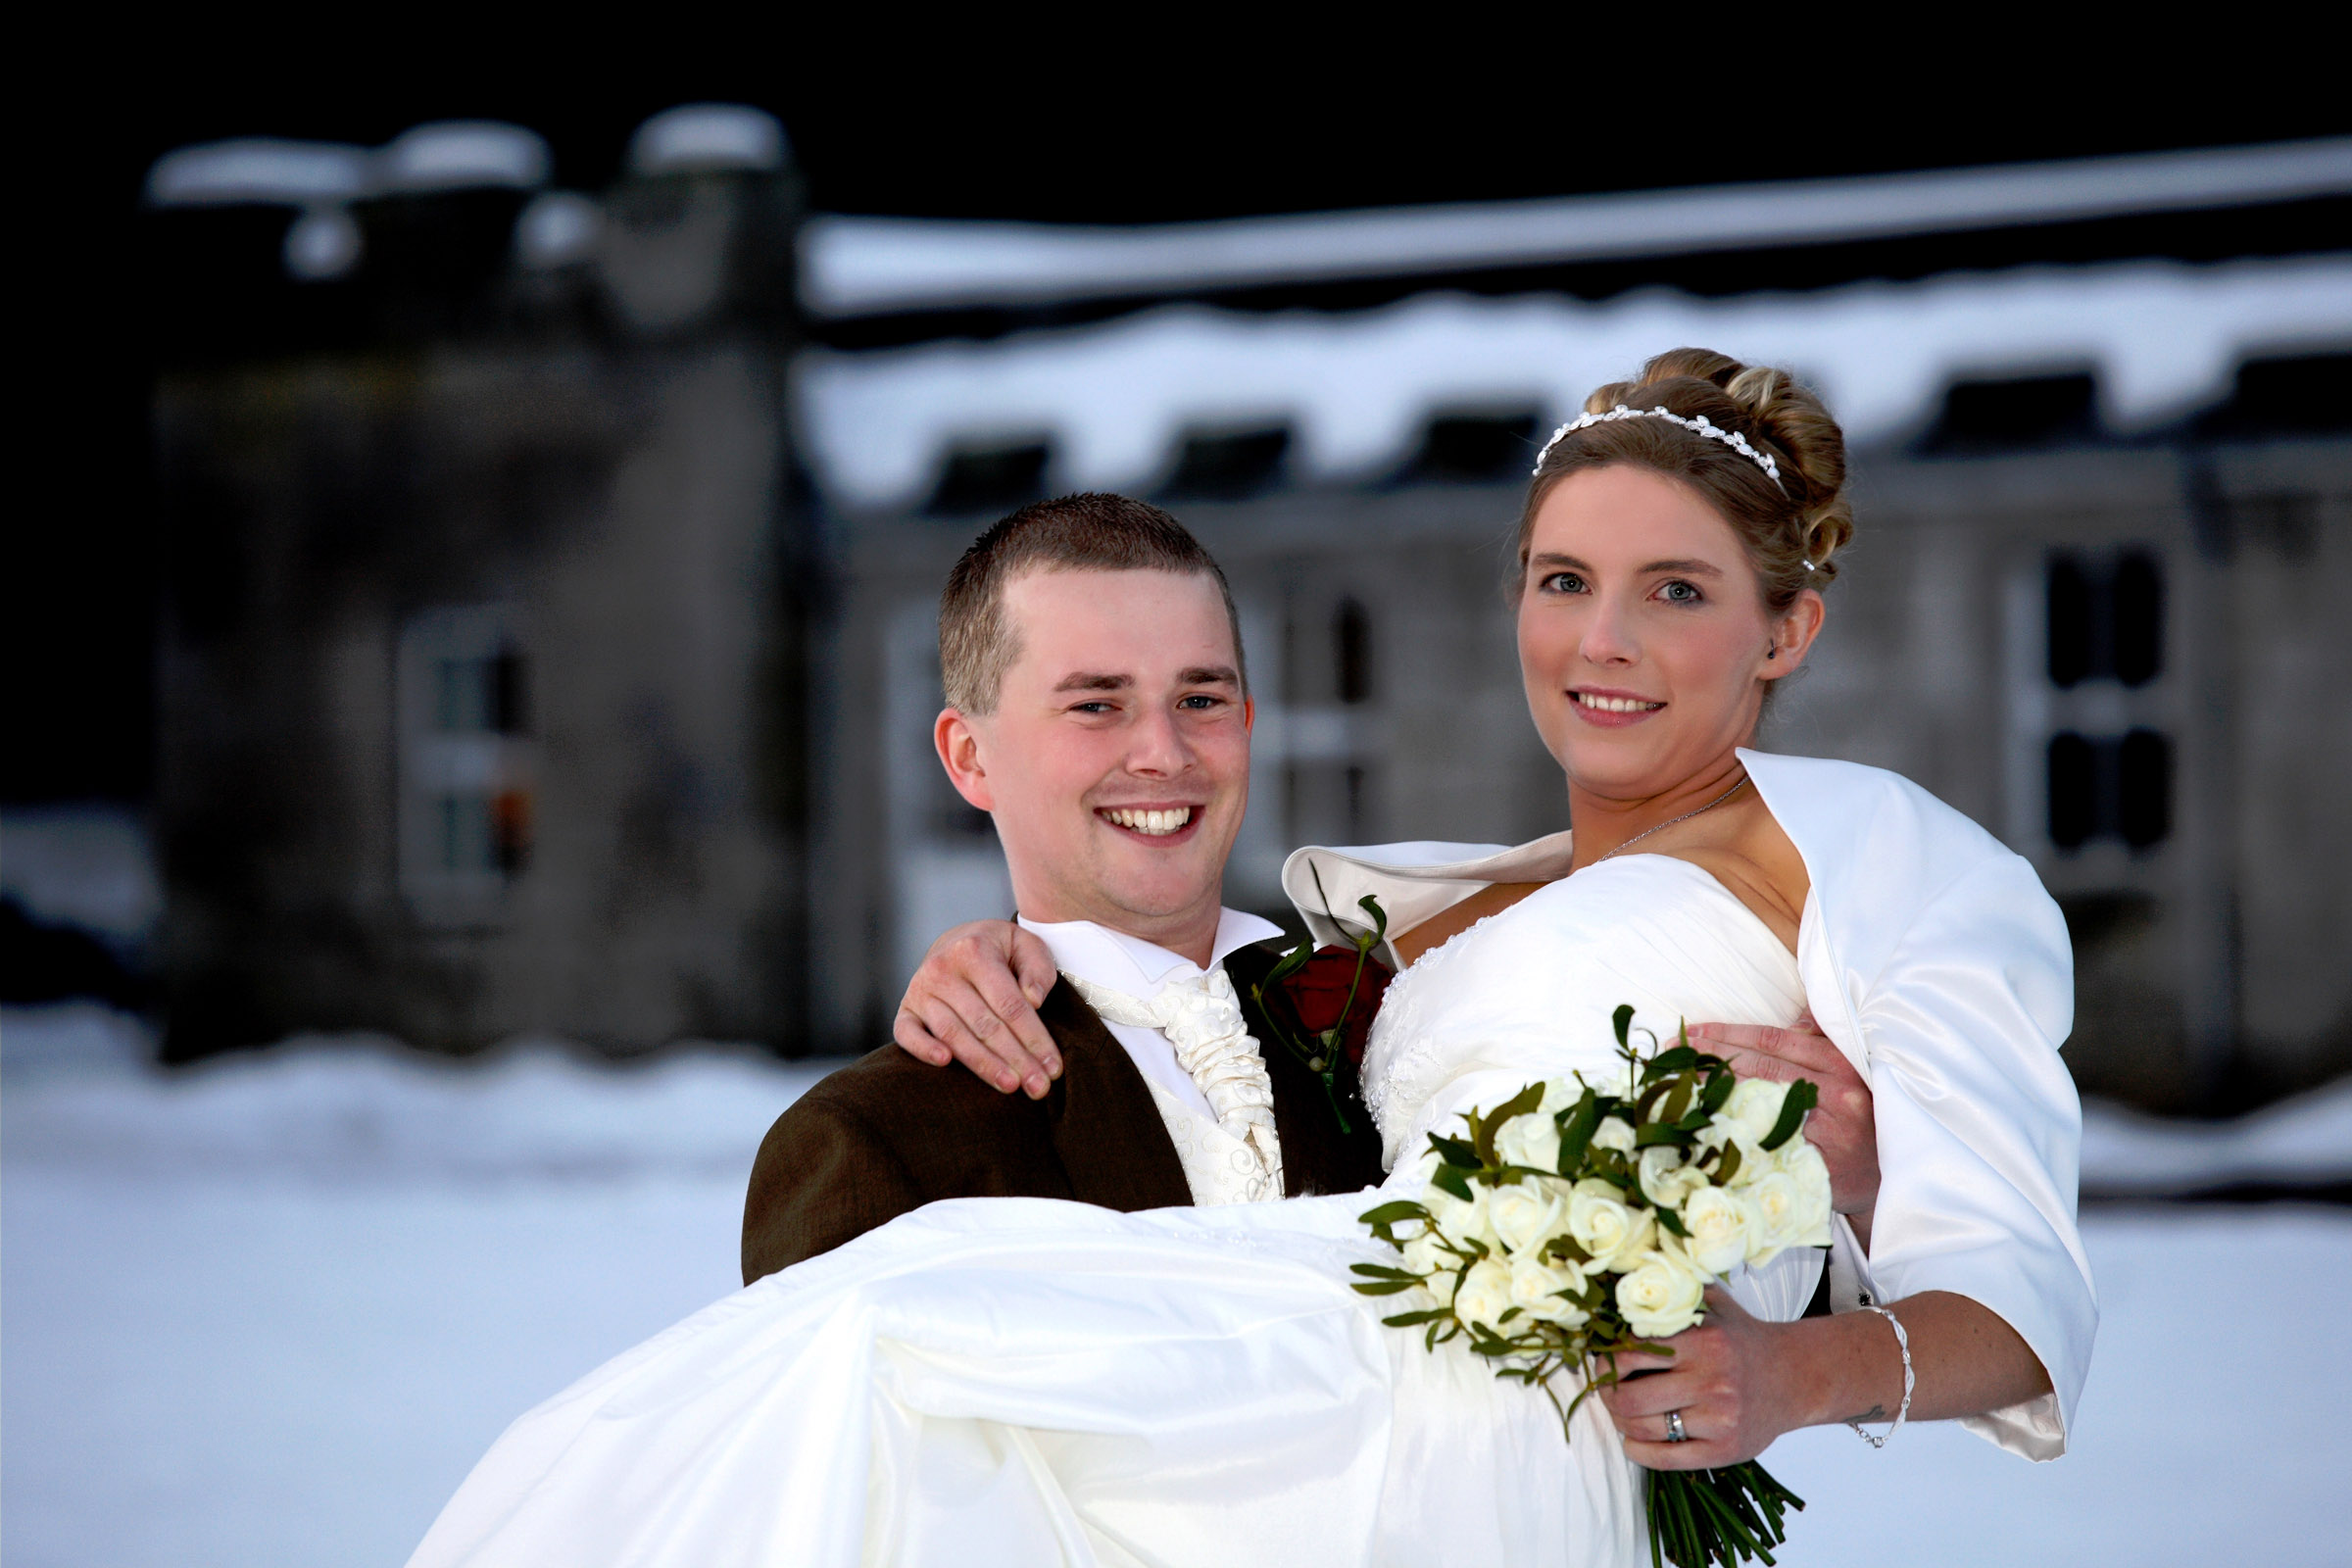 Winter_wonderland_wedding_photography_Edinburgh.jpg